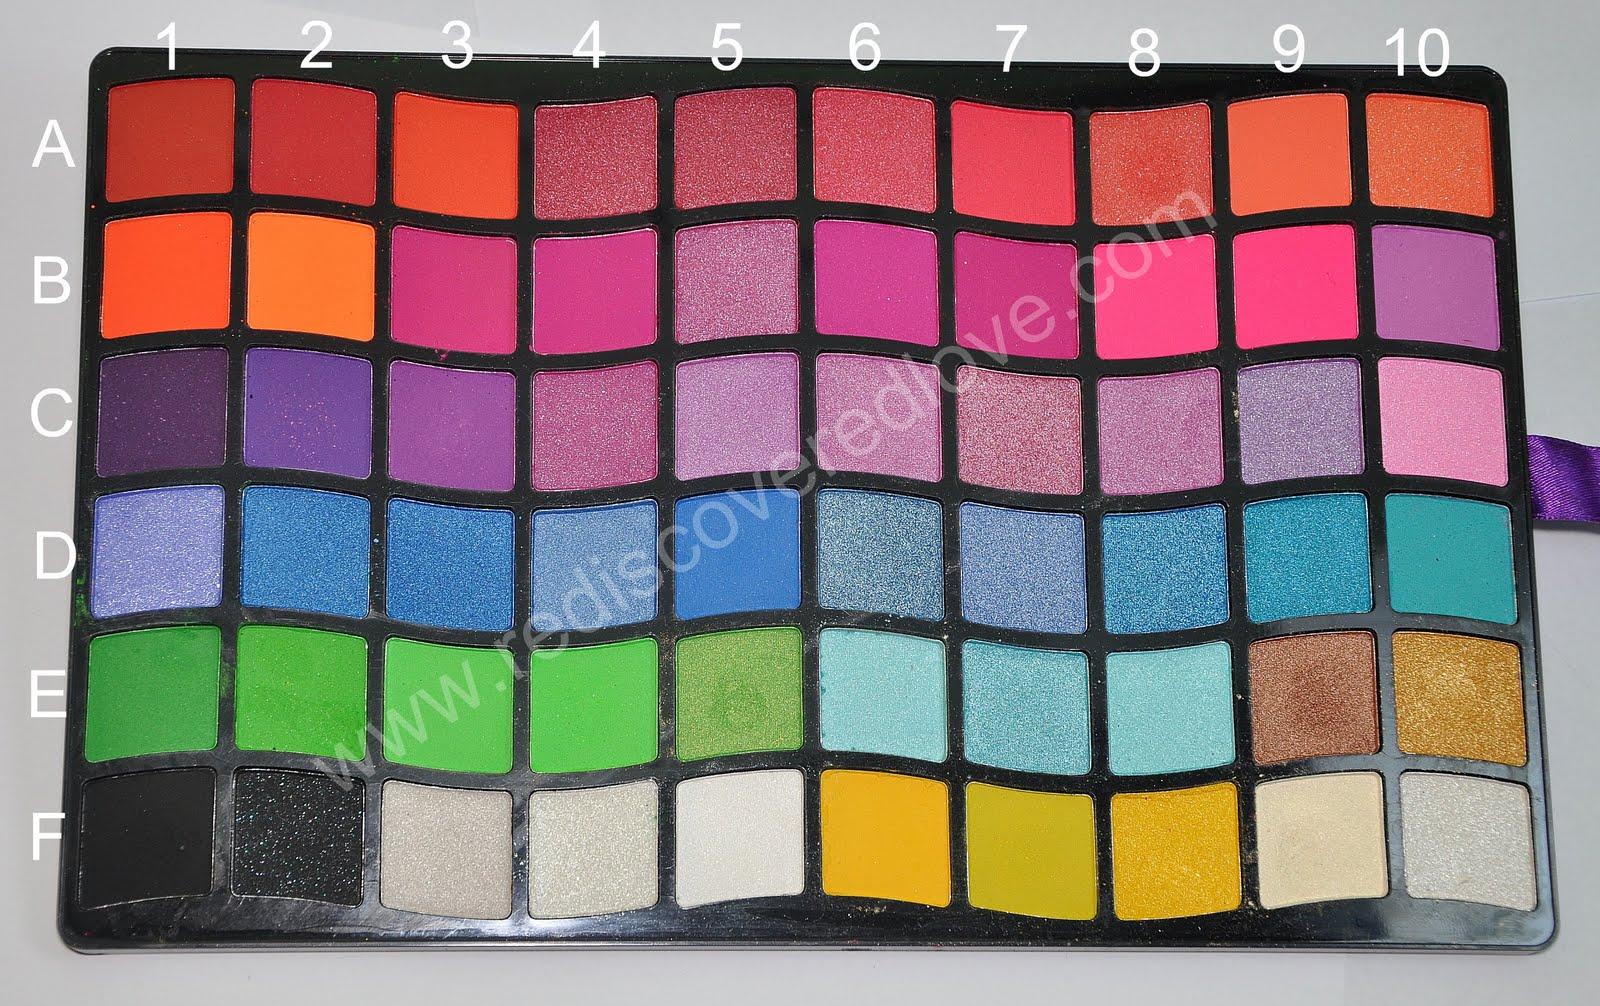 88 colors pallete in B2  neon